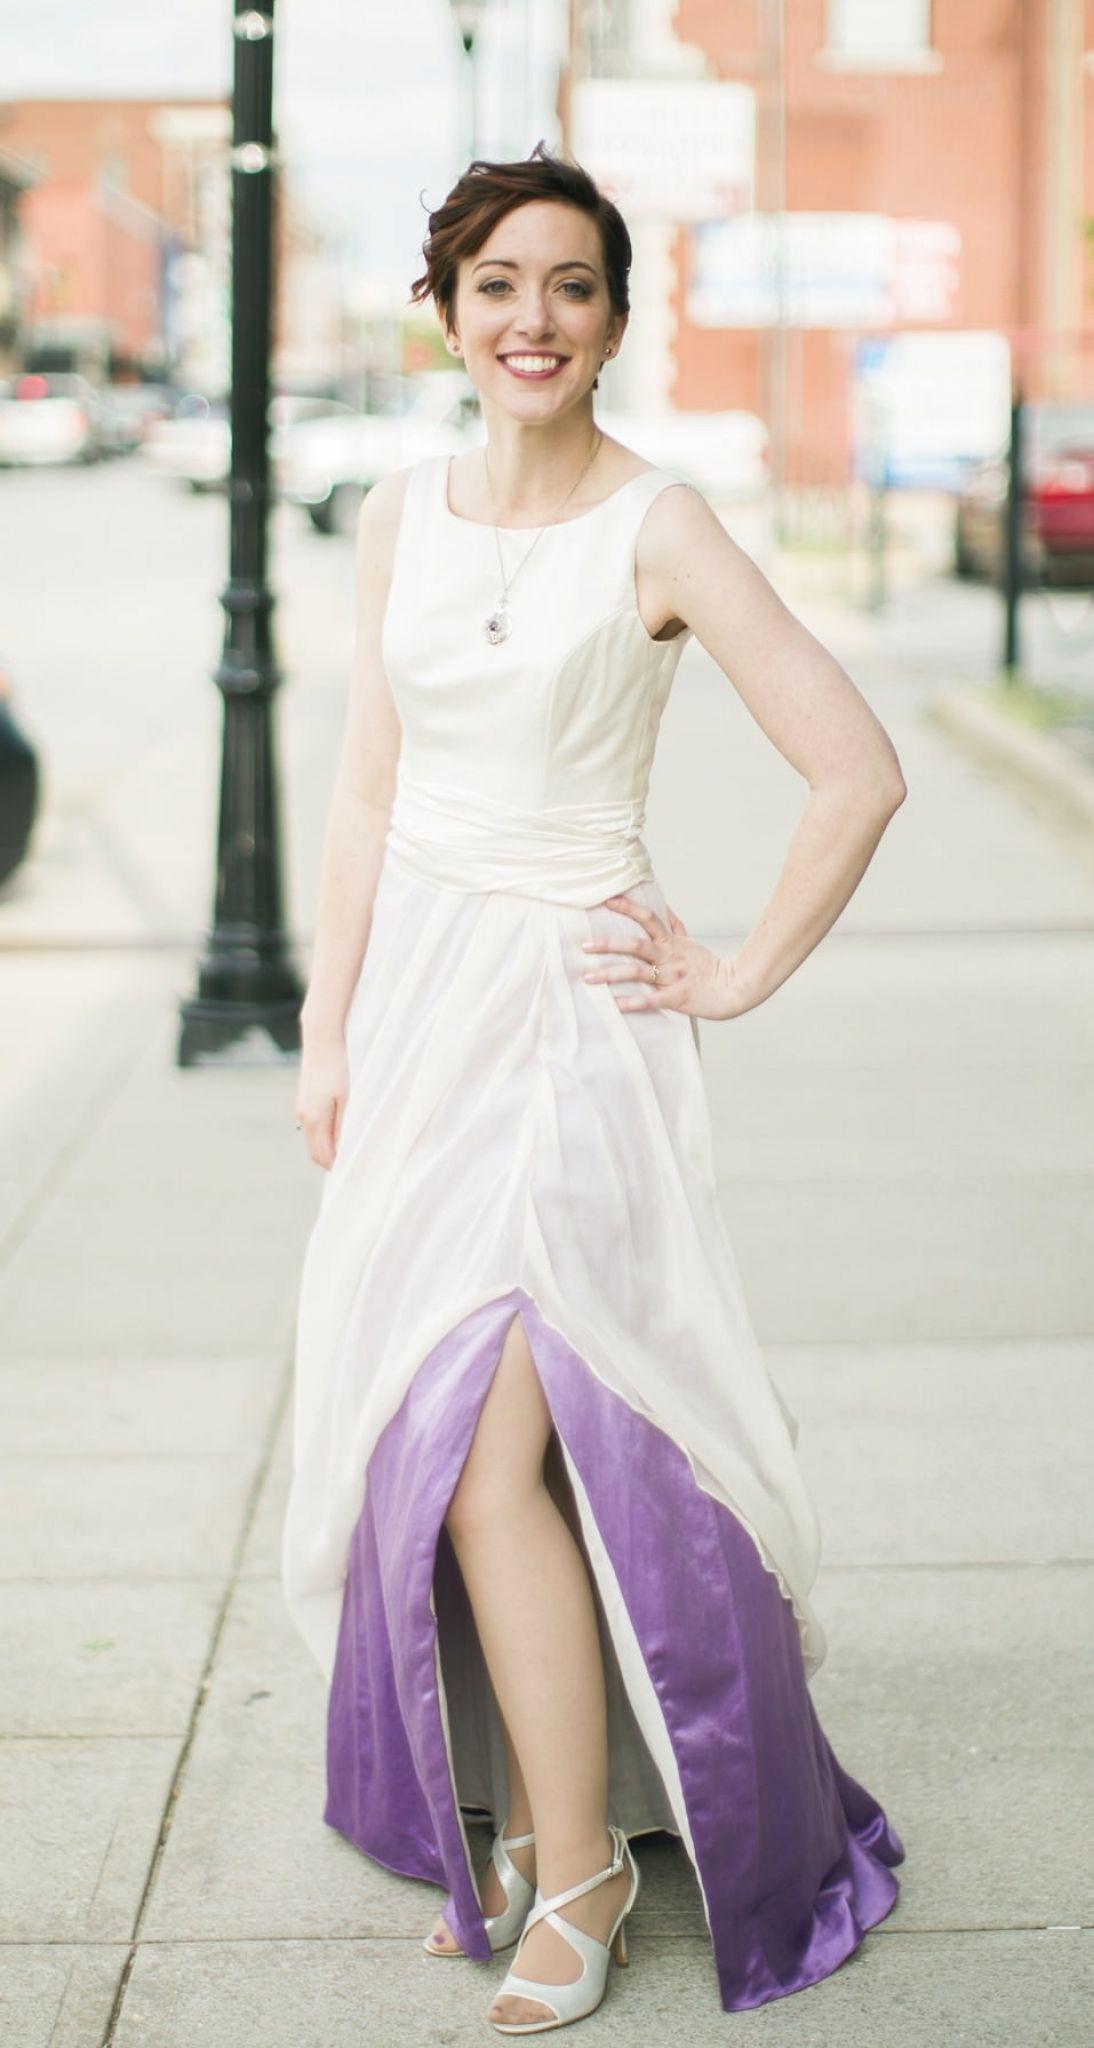 Wedding dresses springfield mo  wedding dresses in springfield mo  best dresses for wedding Check